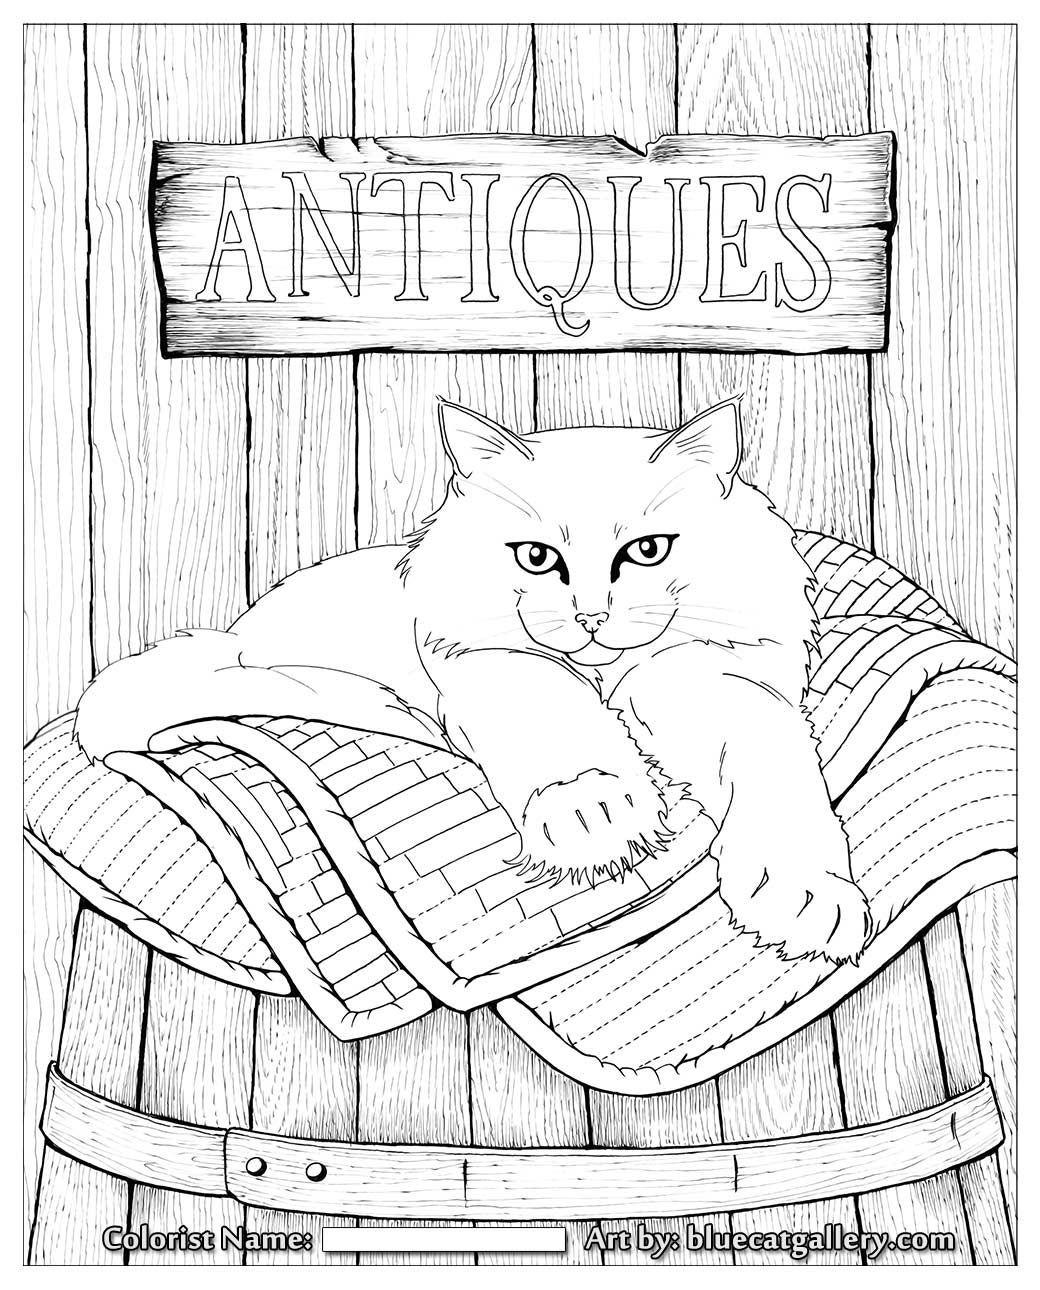 Jason Hamilton Coloring Books Google Search Dieren Kleurplaten Kleurboek Katten Tekening